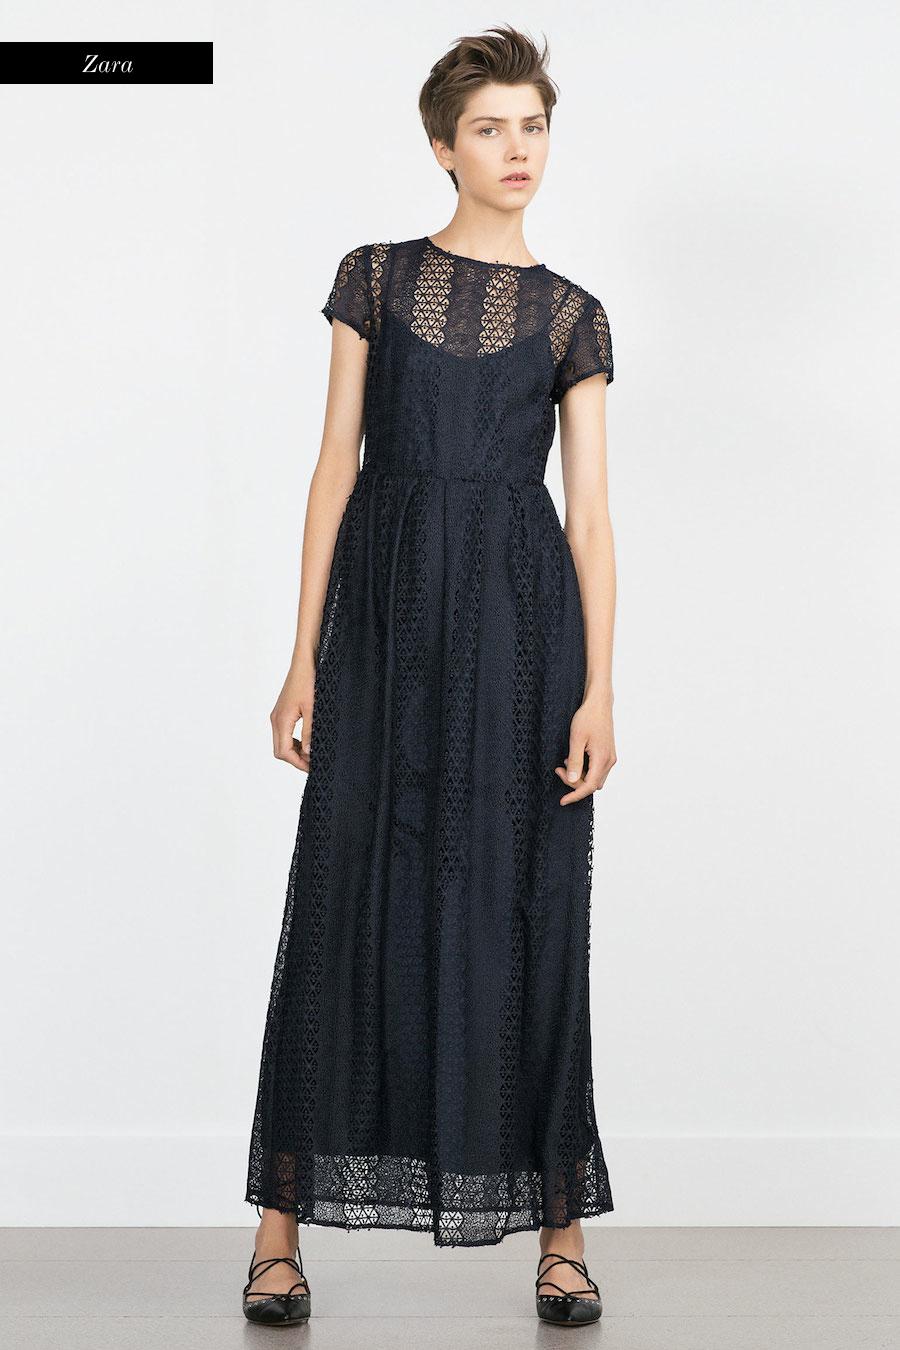 Maxi dress under 200 fash-n-chips.com 14